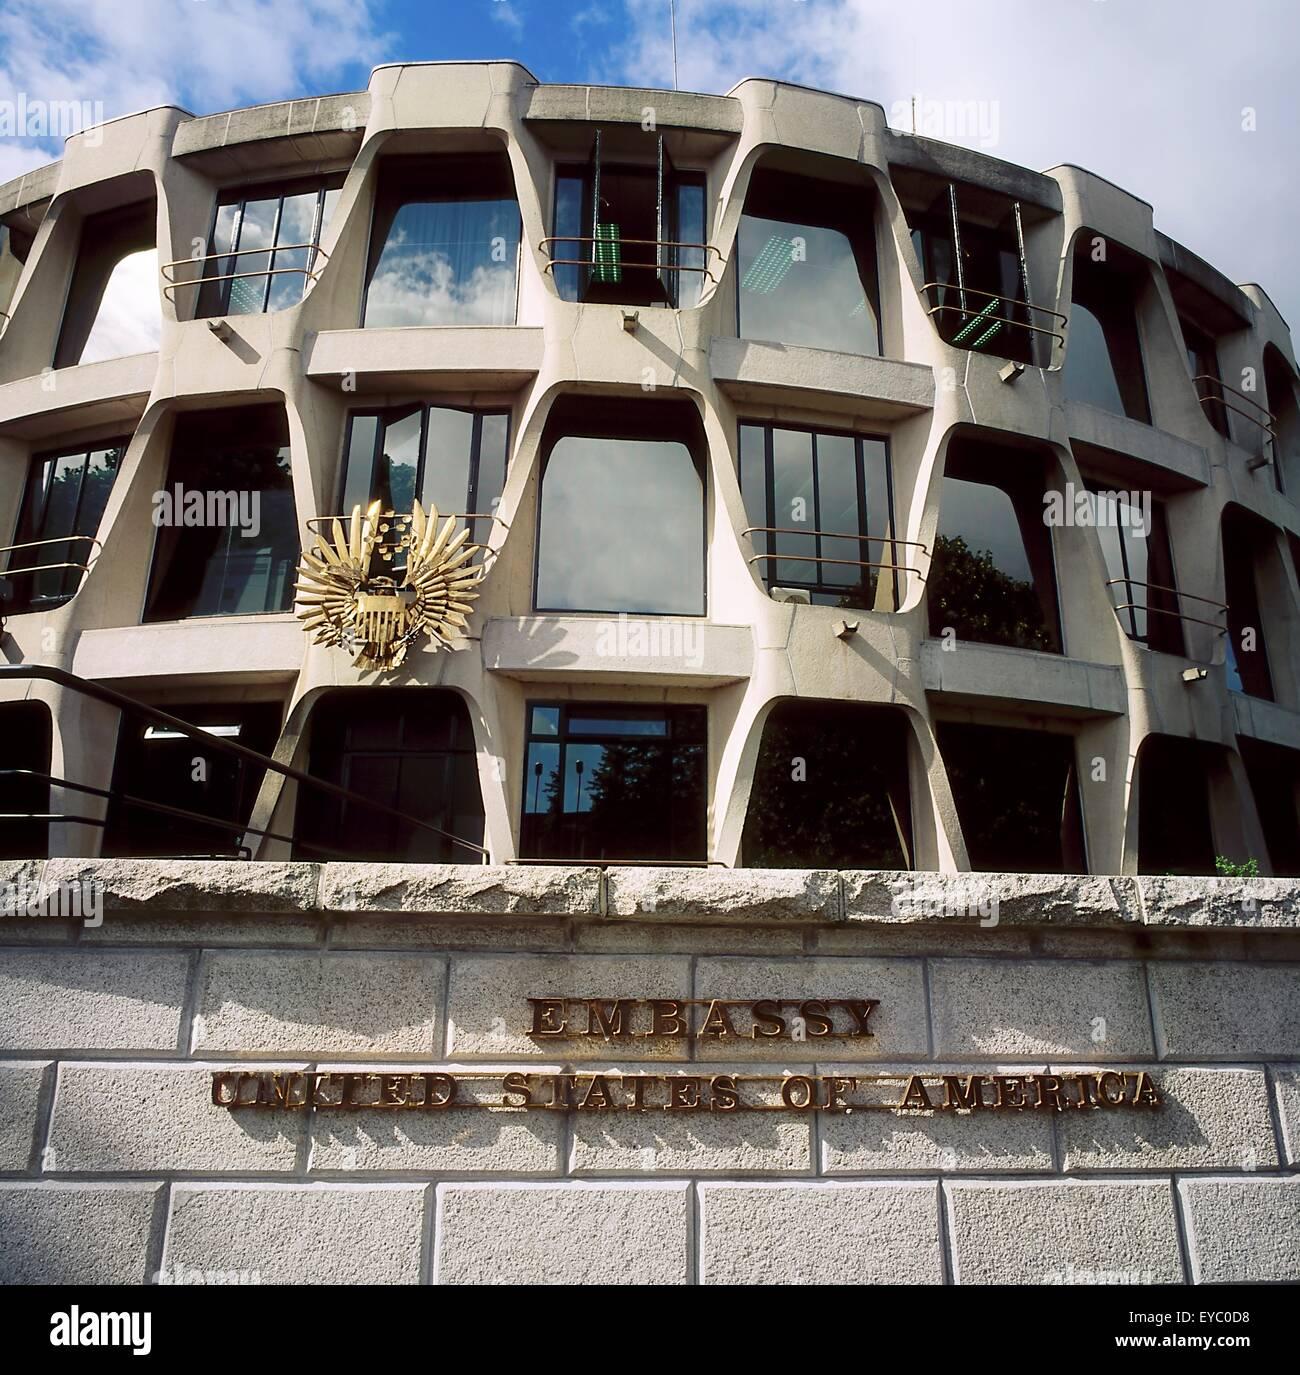 Embassy Of The United States Of America, Dublin, Co Dublin, Ireland - Stock Image